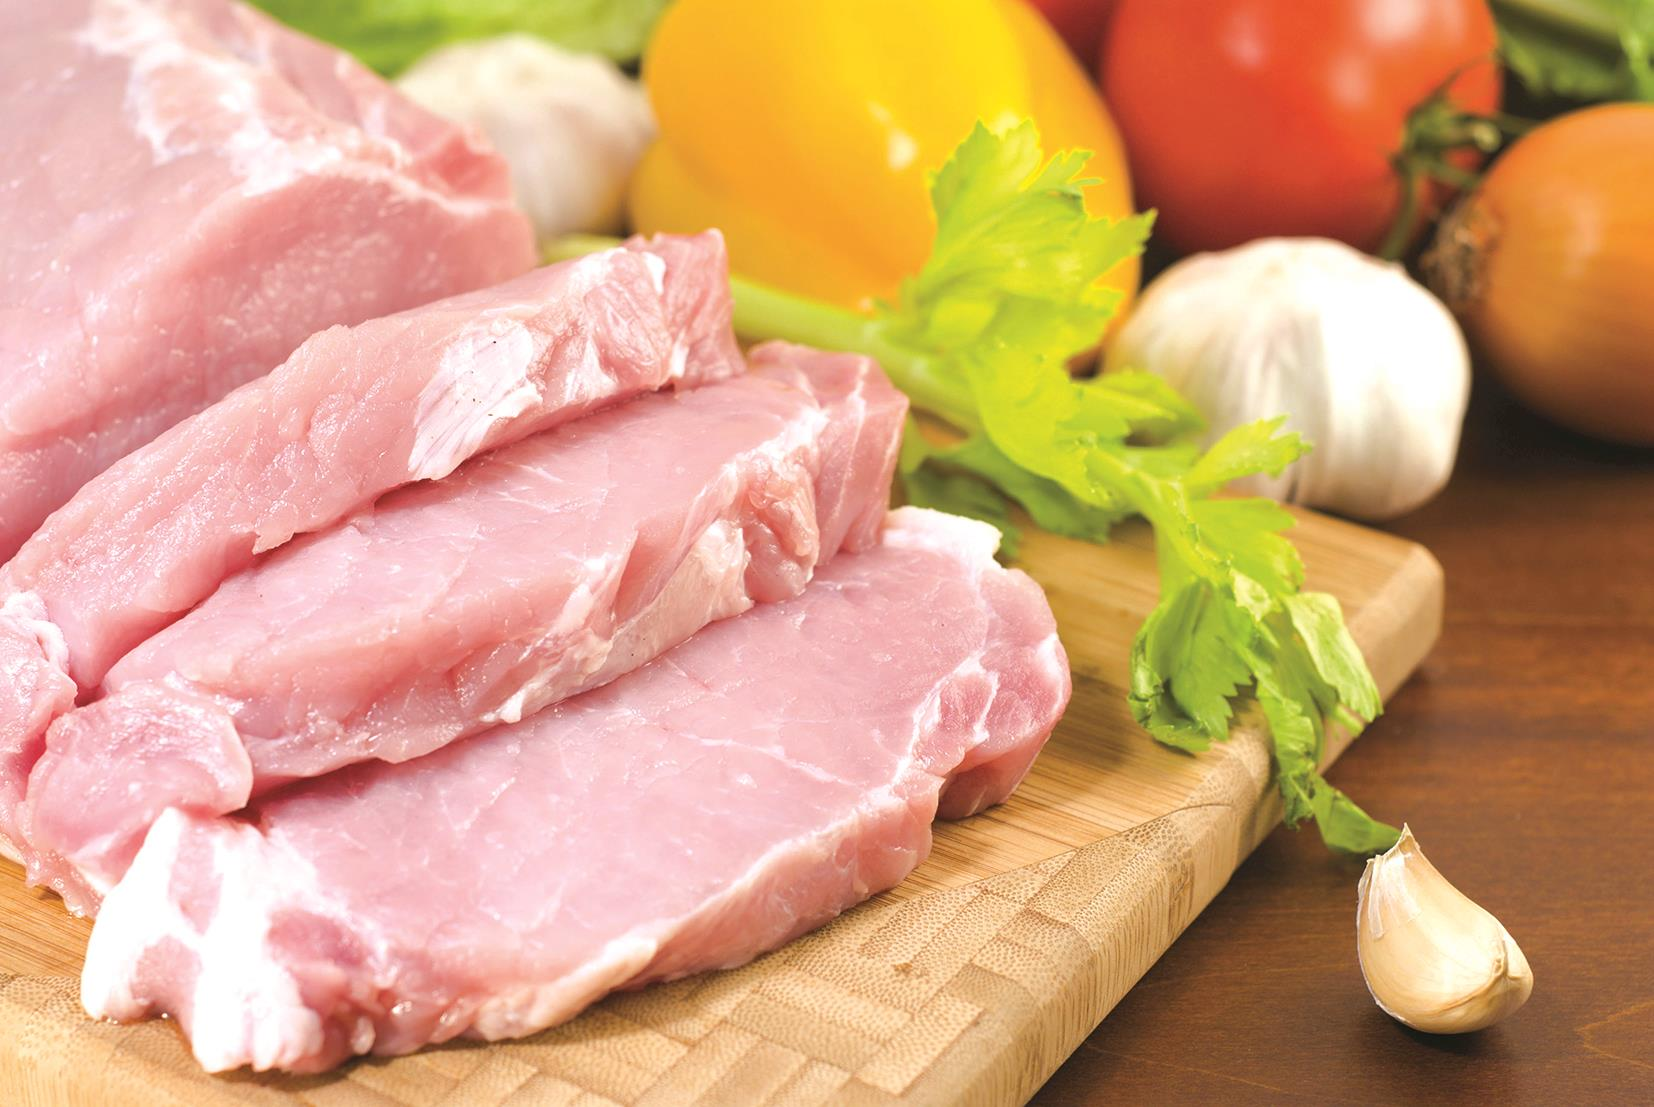 Estados Unidos abatem 455 mil suínos por dia